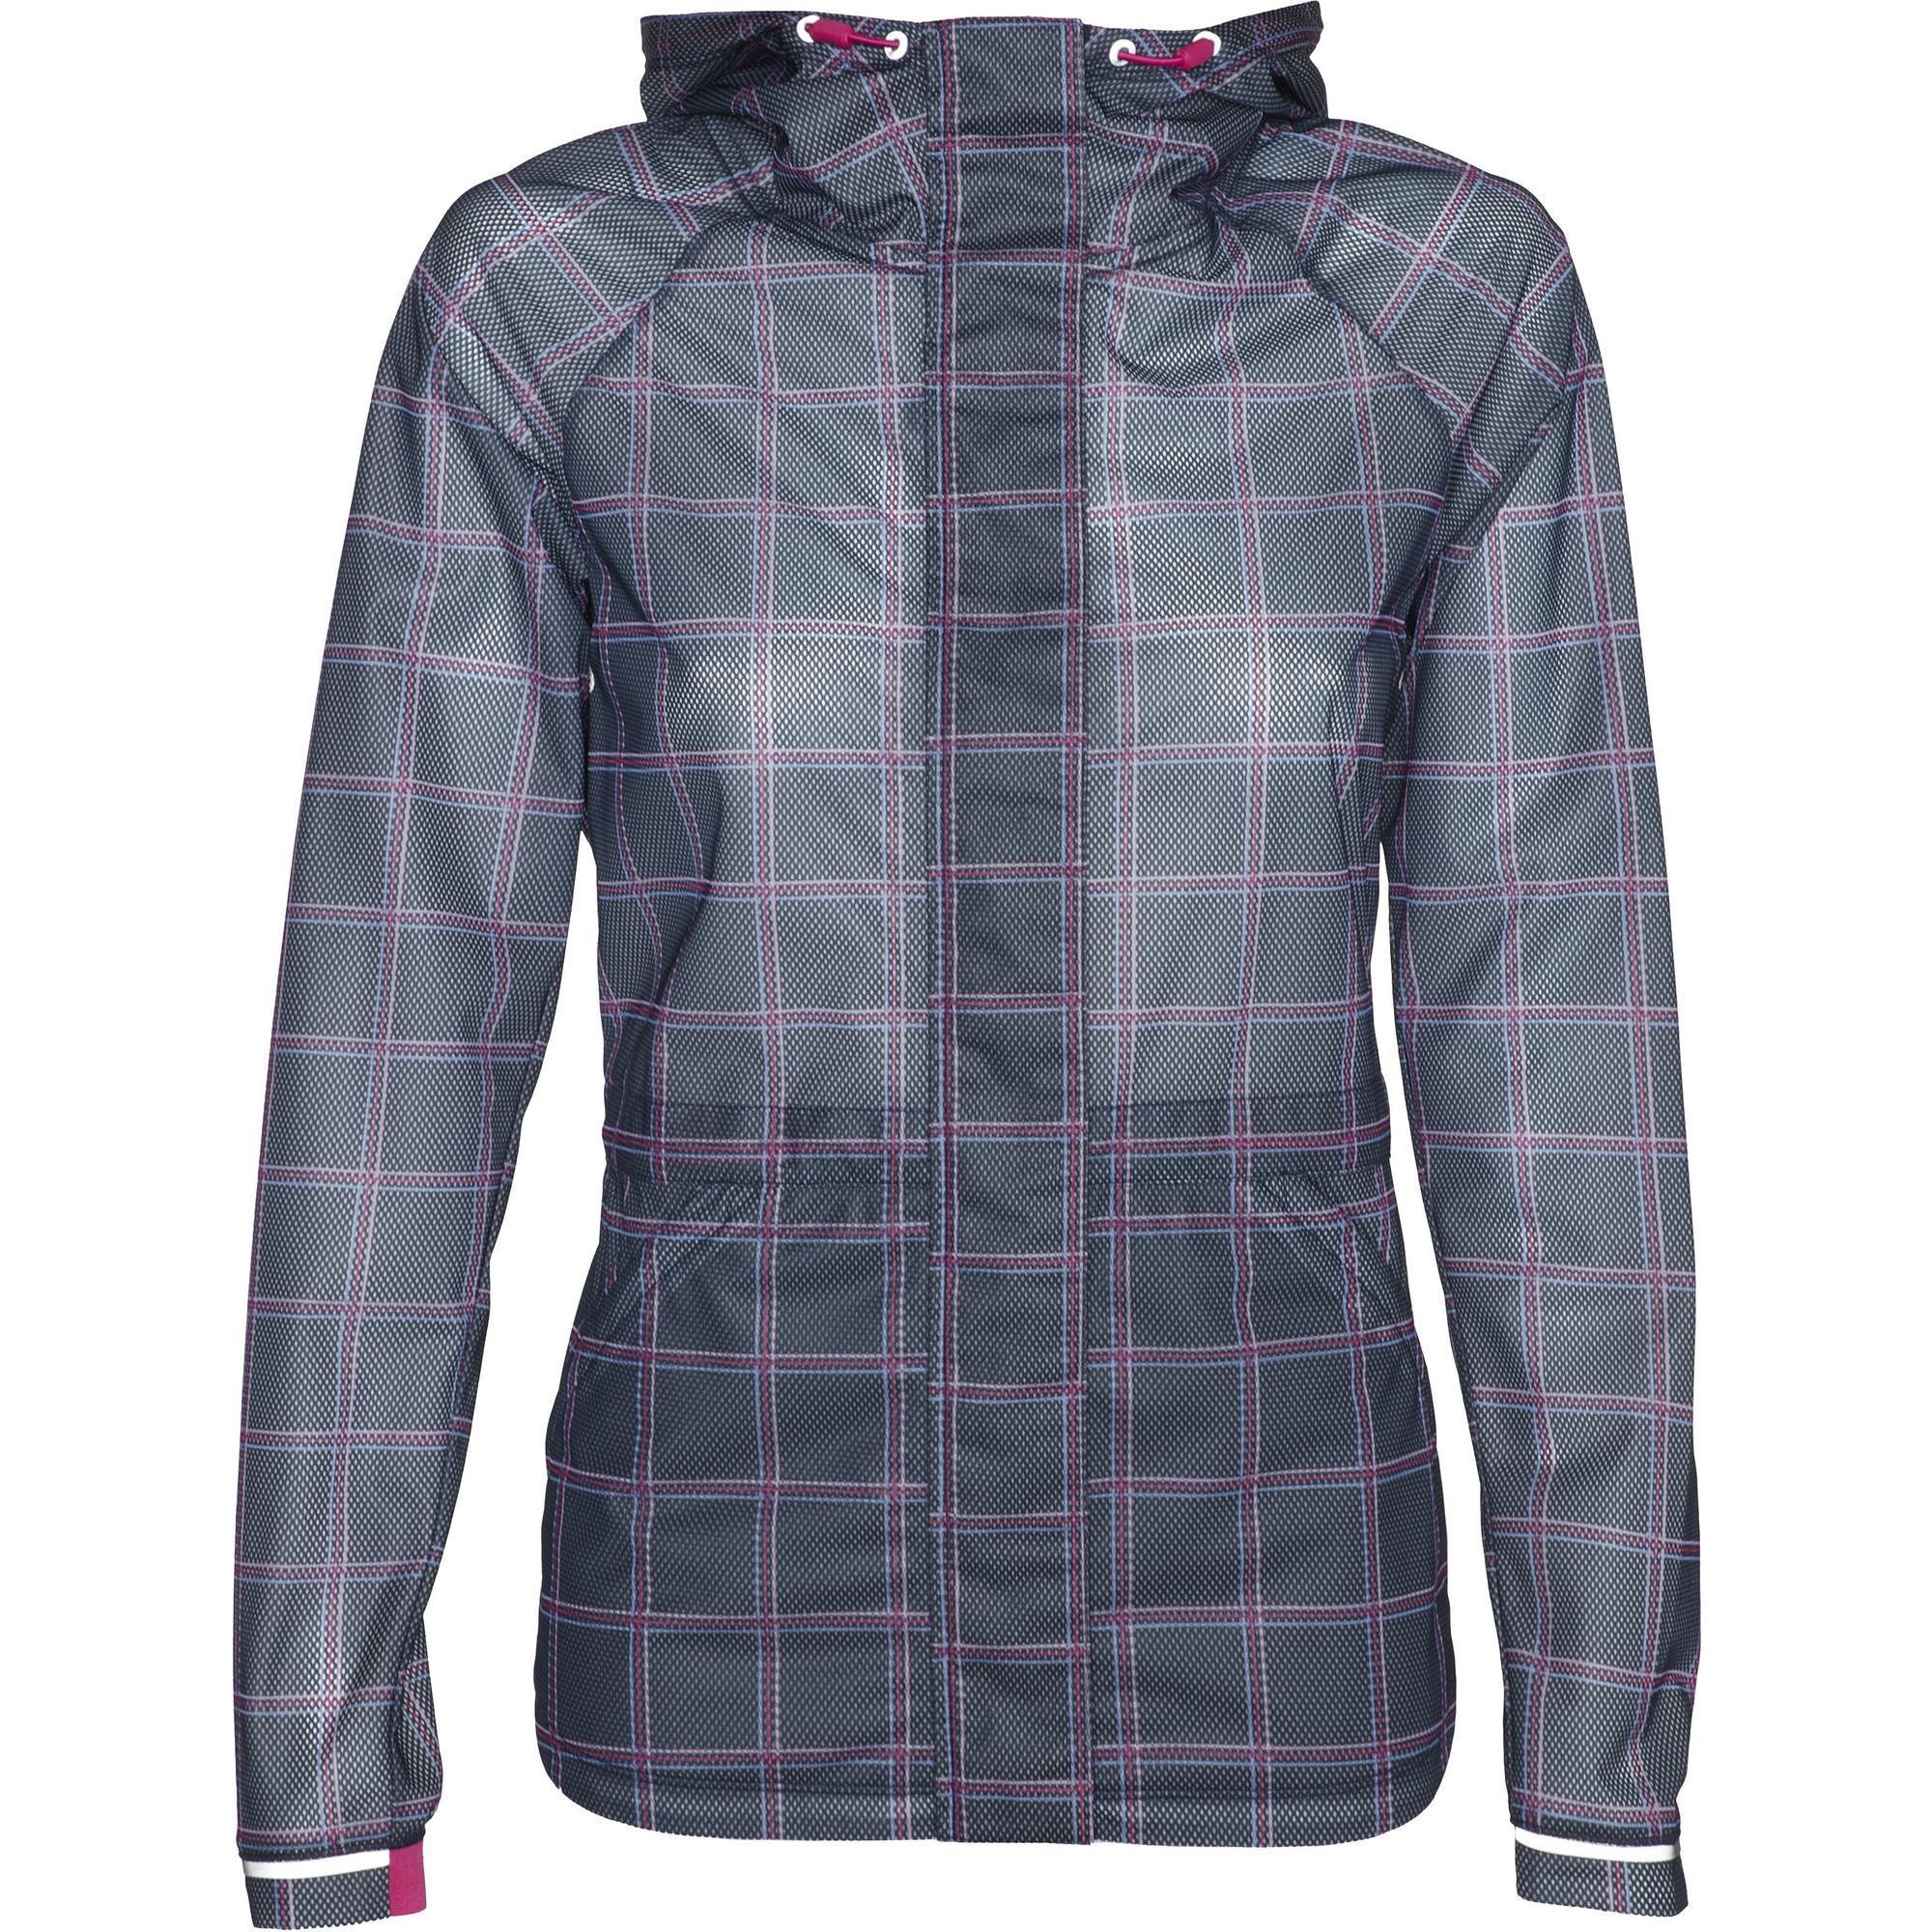 Women's Gosheild Jubilee Jacket